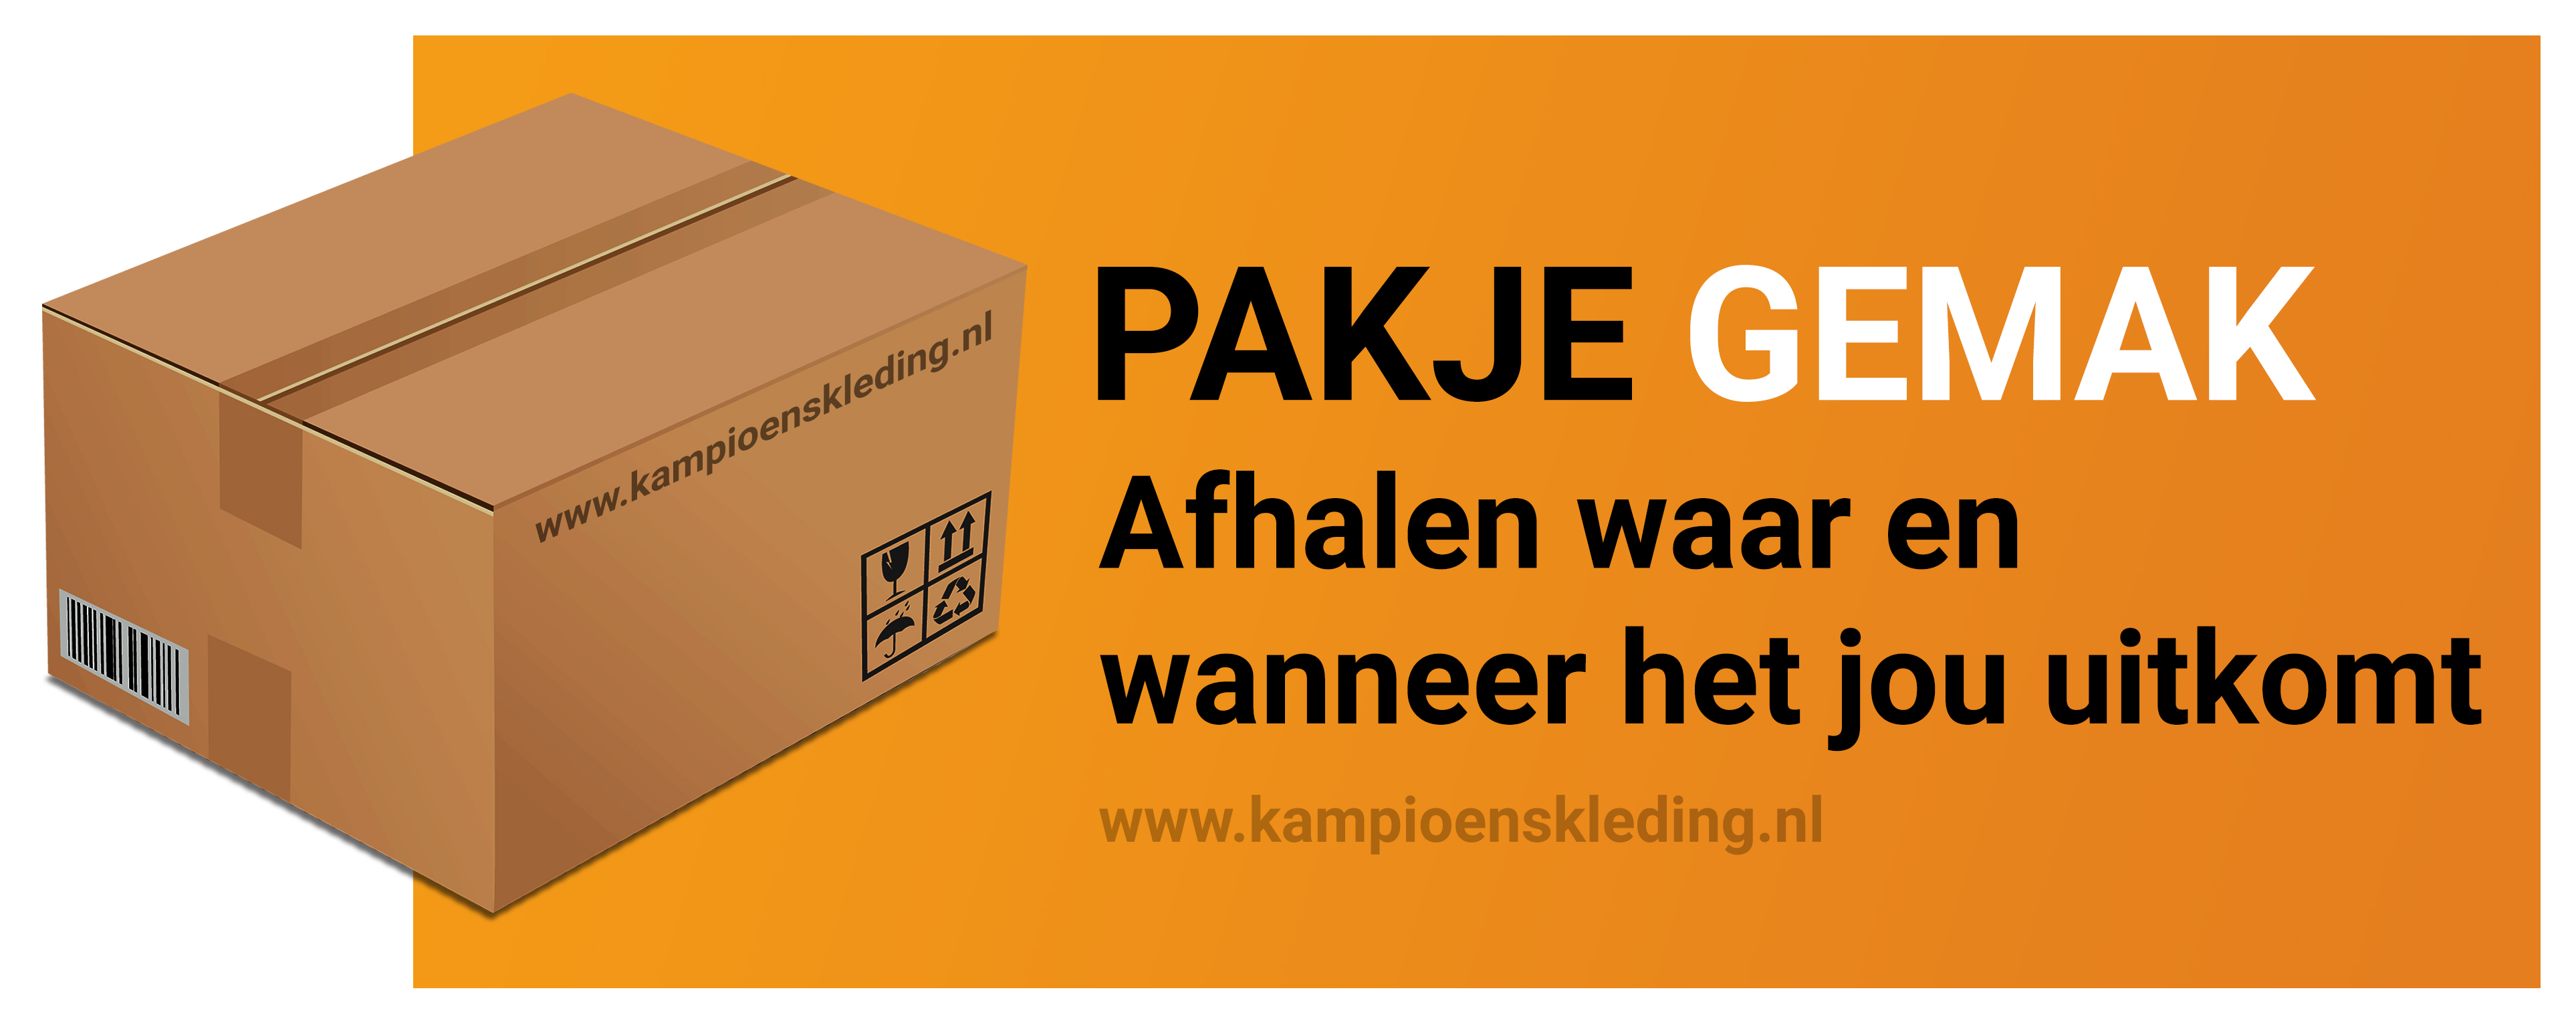 Pak je gemak, afhalen wanneer het je uitkomt | kampioenskleding.nl